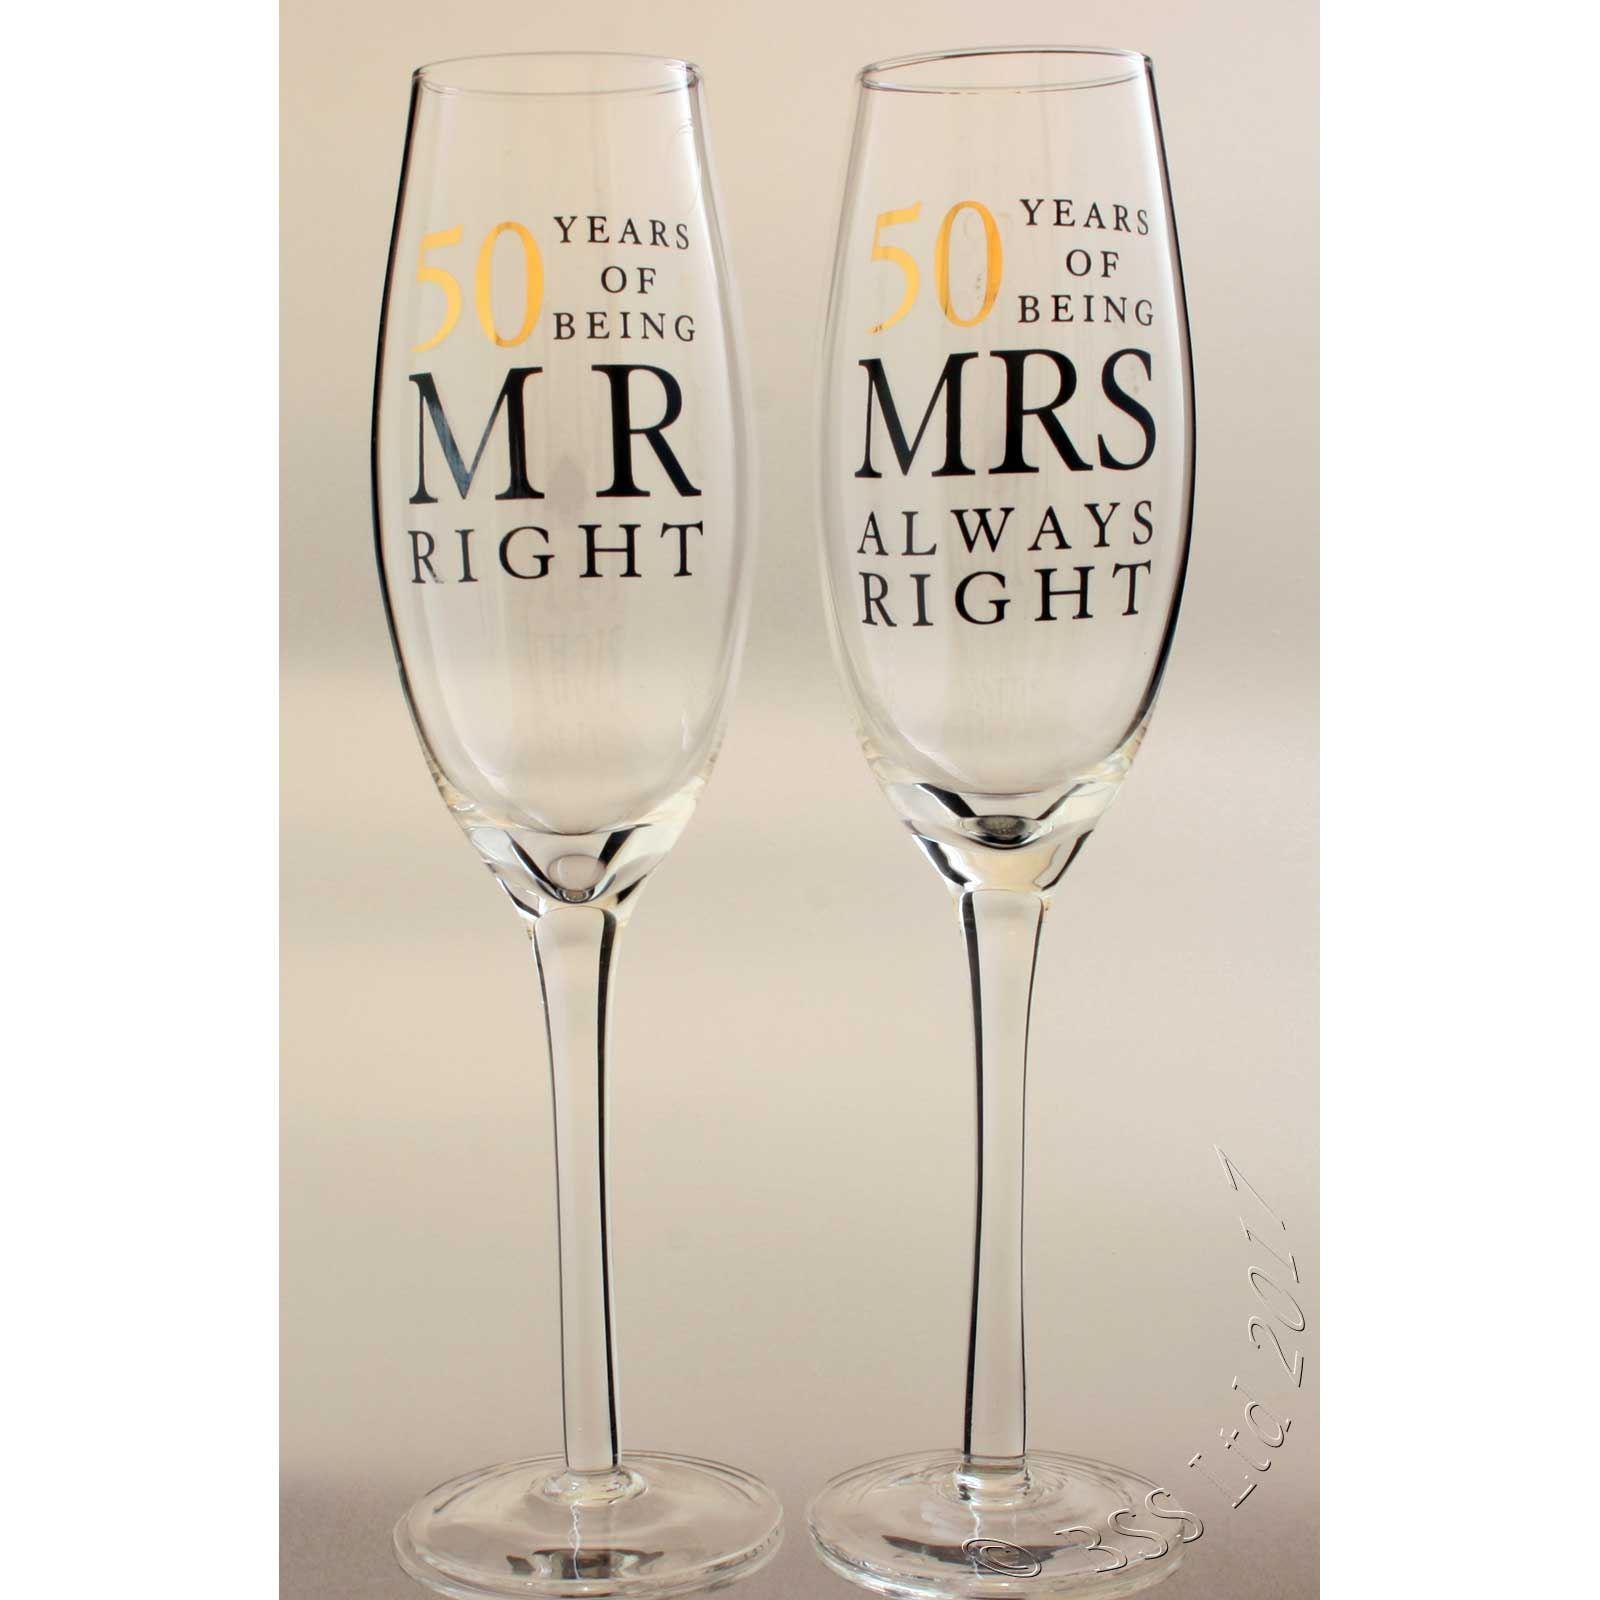 50th Wedding Anniversary Mr & Mrs Right Champagne Glasses Gift Set ...